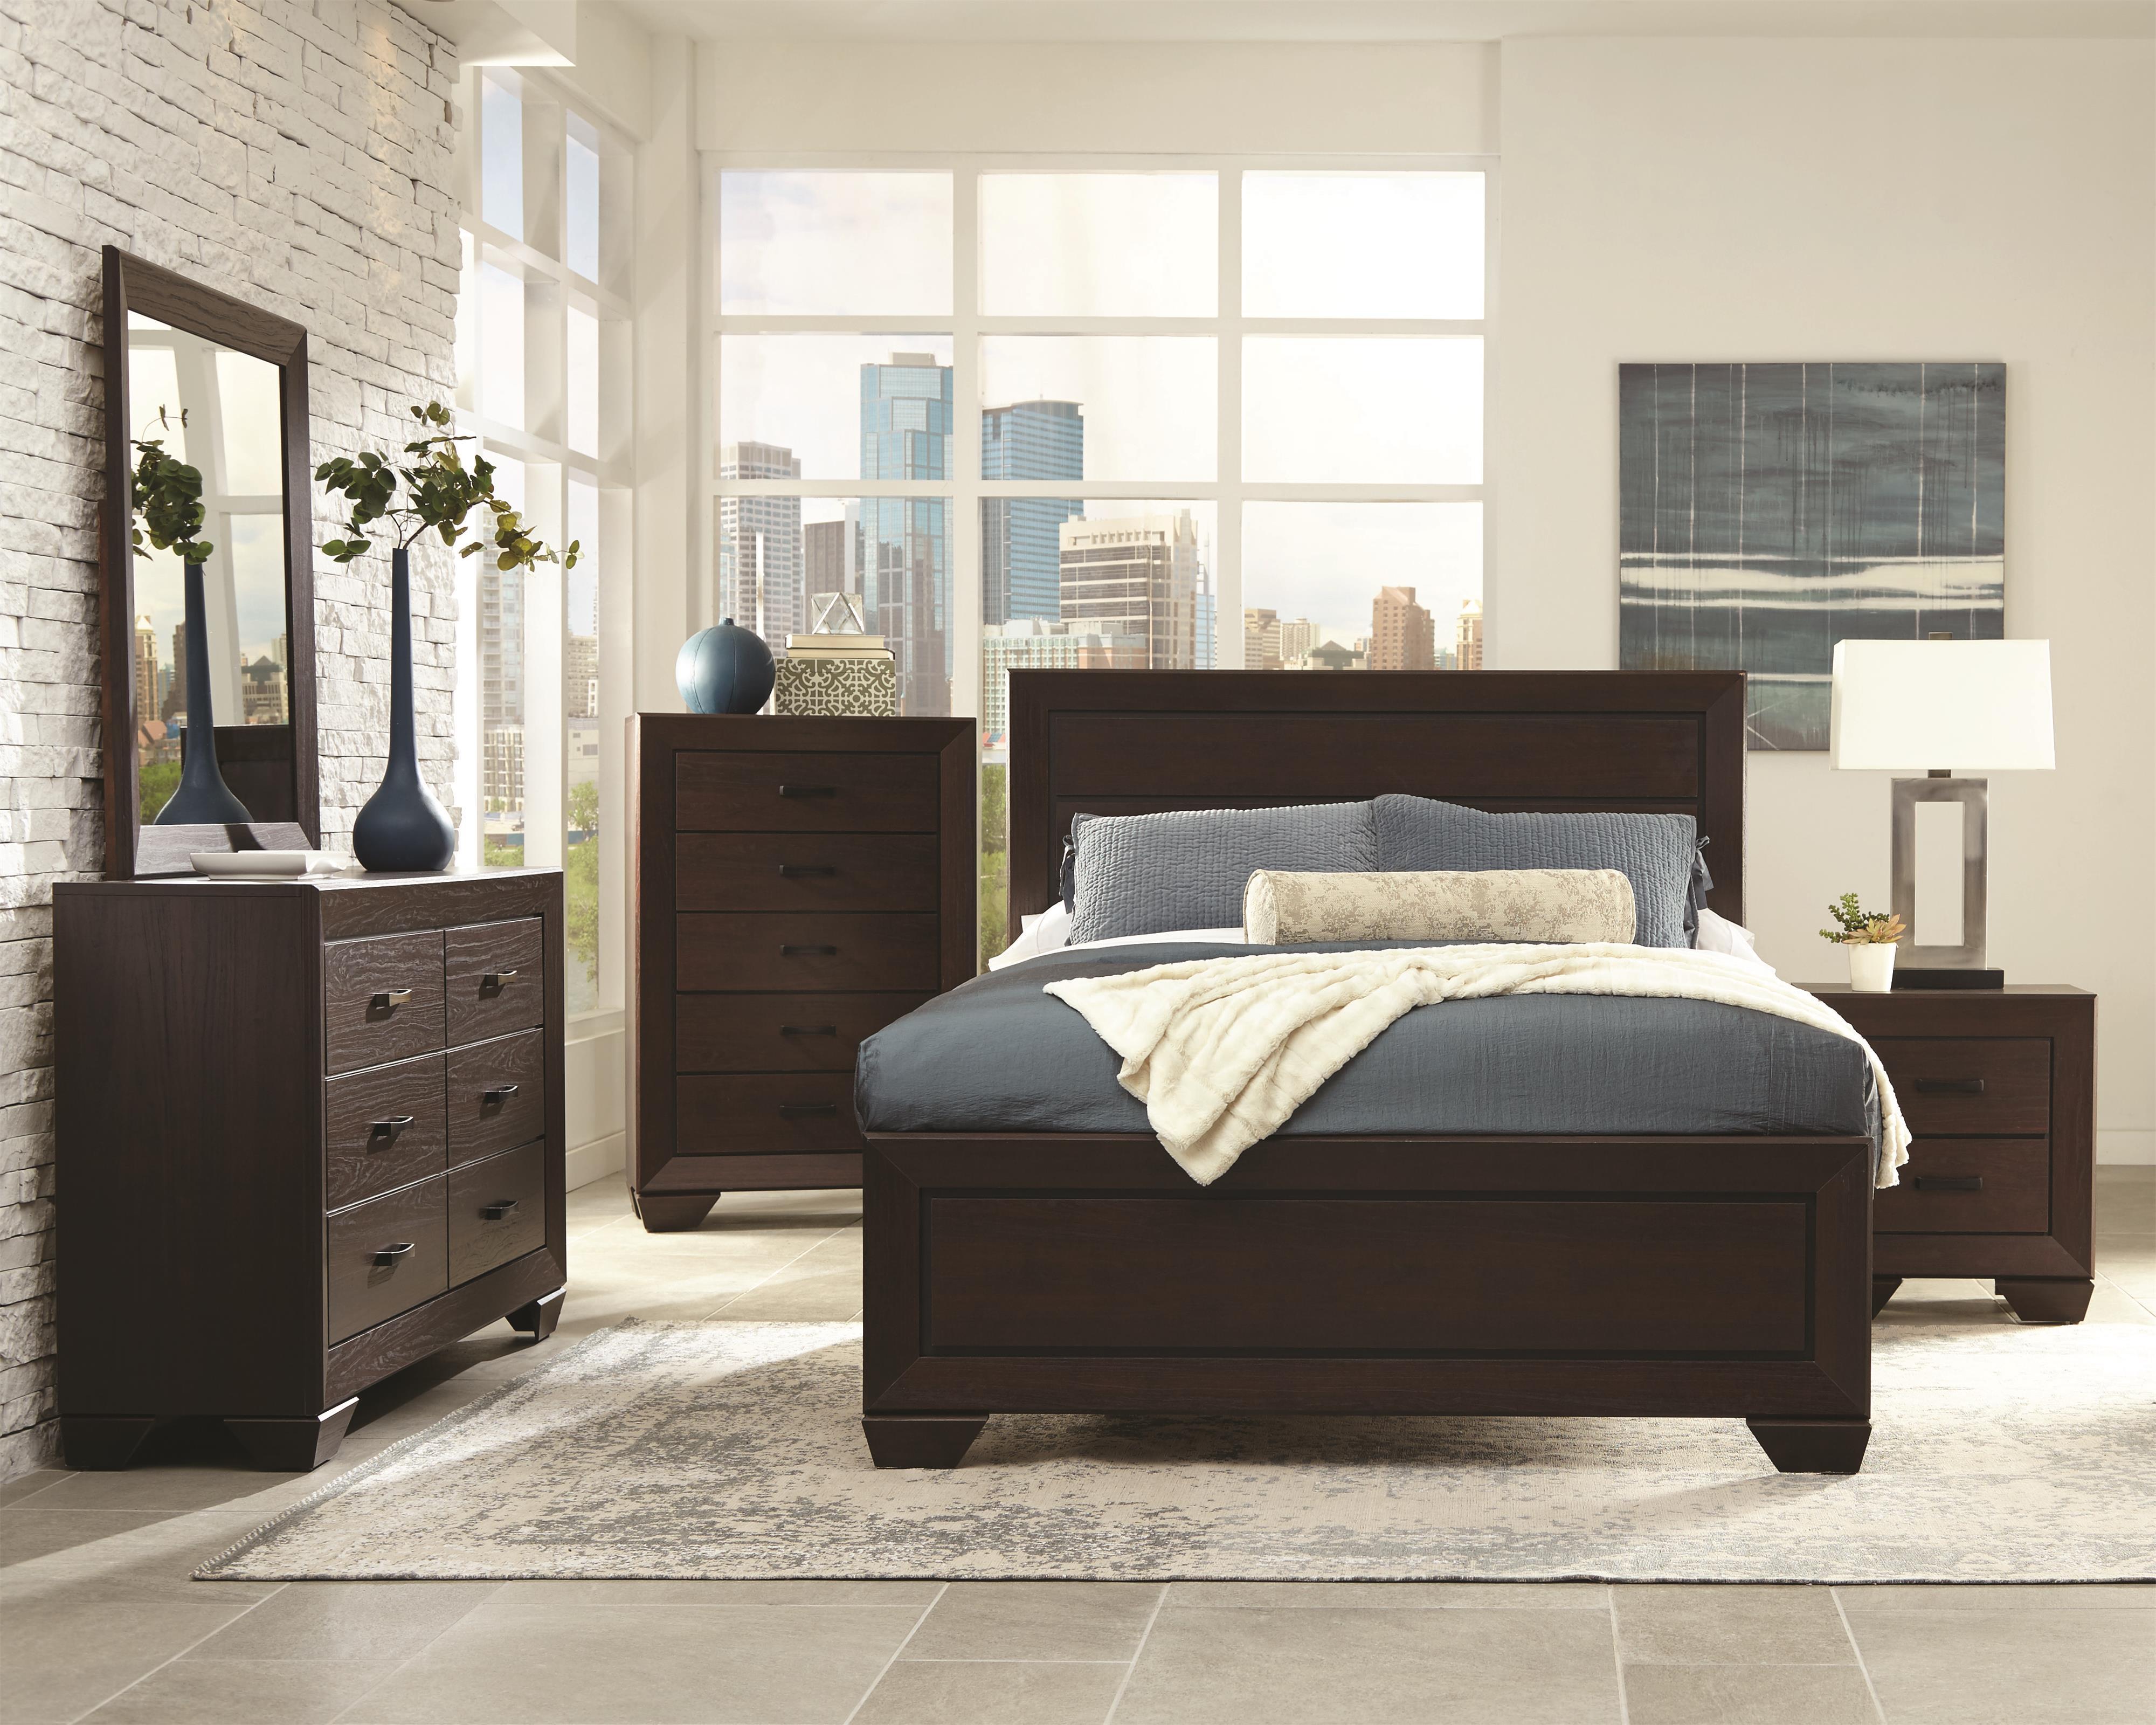 Coaster Fenbrook Queen Bedroom Group Value City Furniture Bedroom Groups